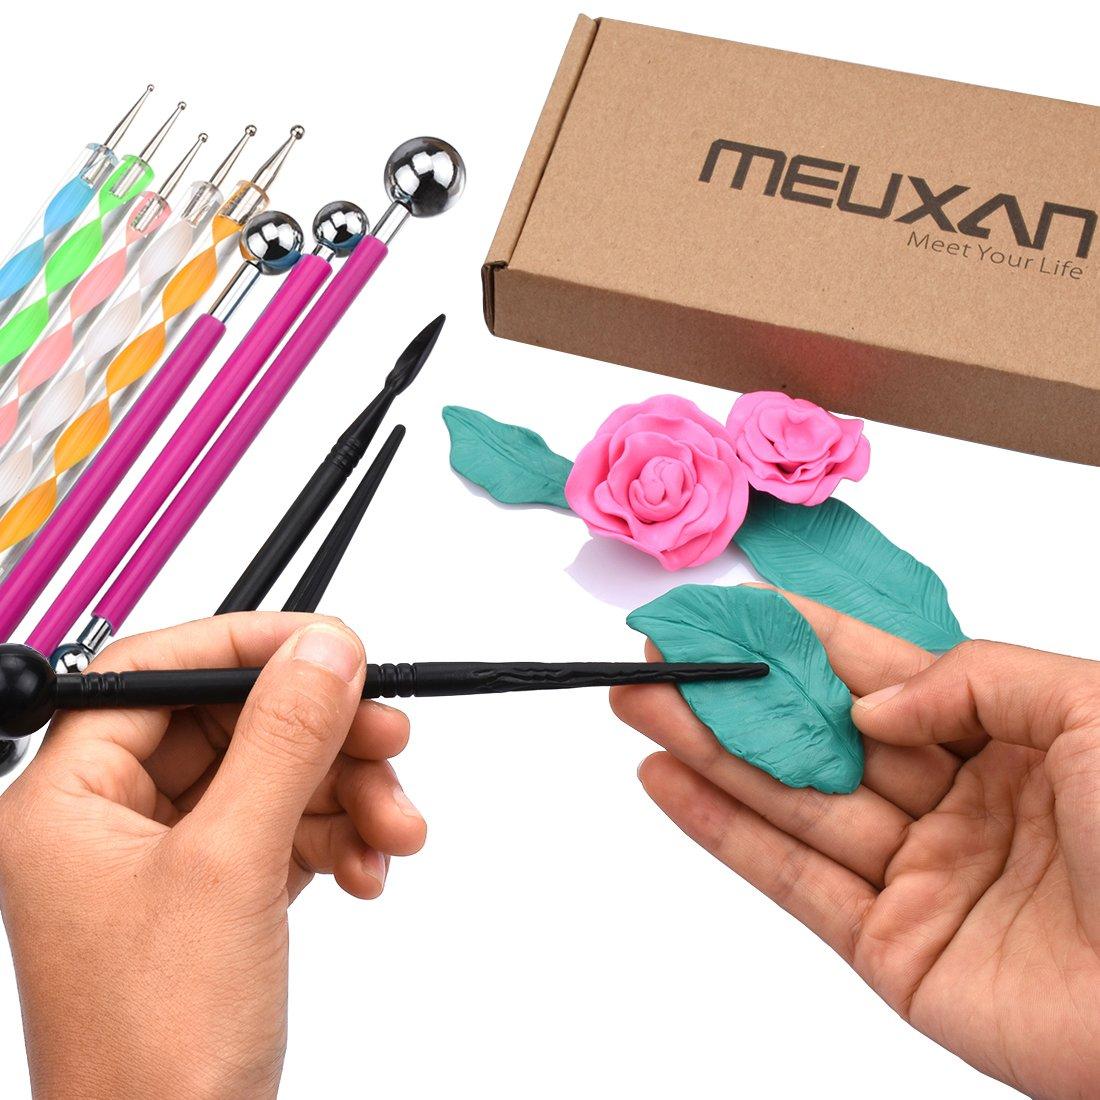 Clay Pottery Modeling Set Meuxan AL051 13 Piece Ball Stylus Dotting Tools Rock Painting Kit